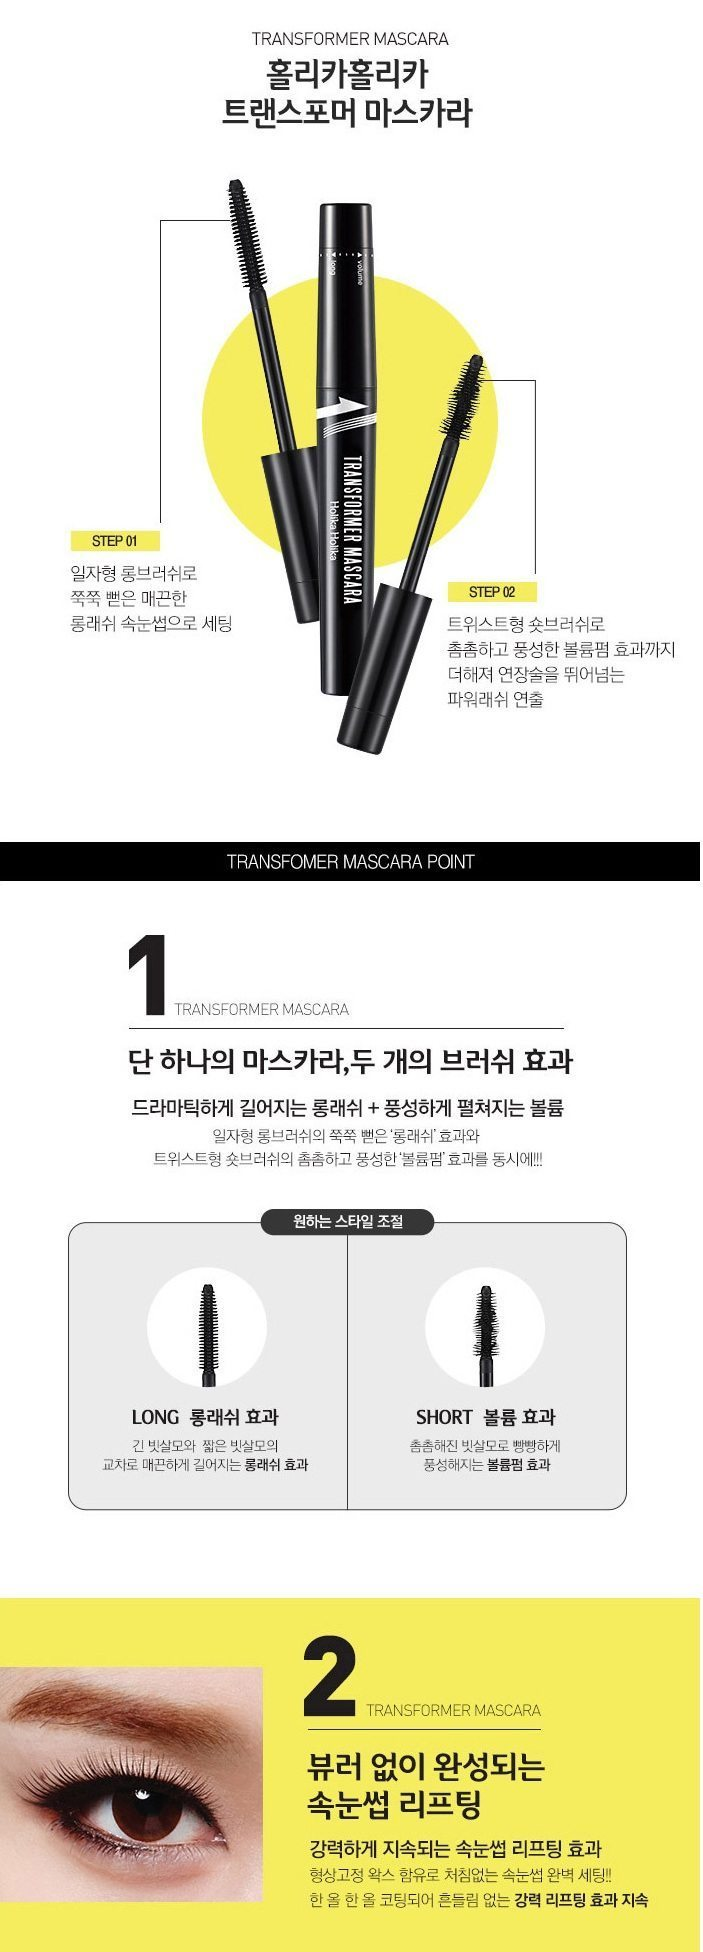 Holika Holika Transformer Mascara korean cosmetic makeup product online shop malaysia vietnam macau2